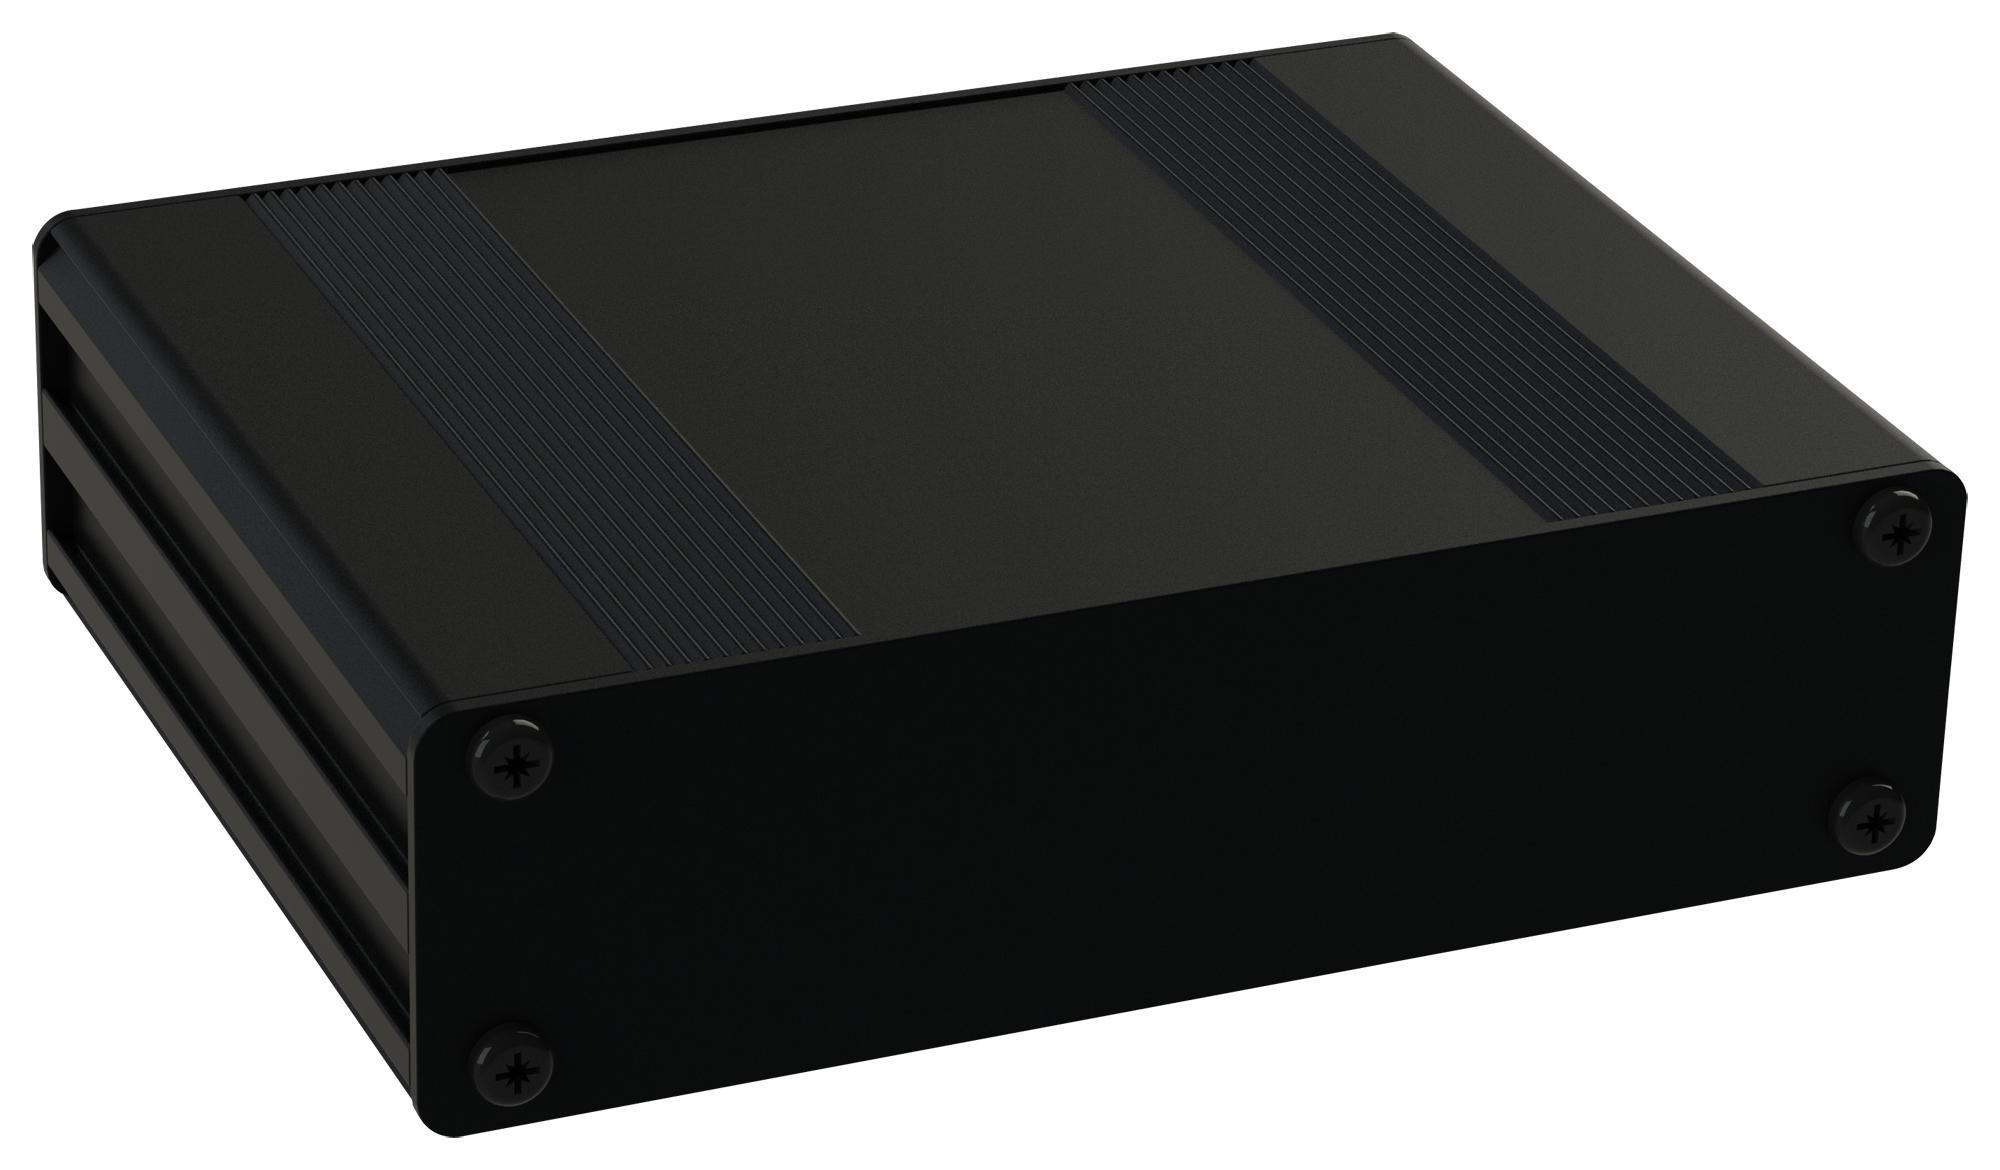 MULTICOMP MC002219 ENCLOSURE, HEAT SINK, ALUM, BLACK by Multicomp